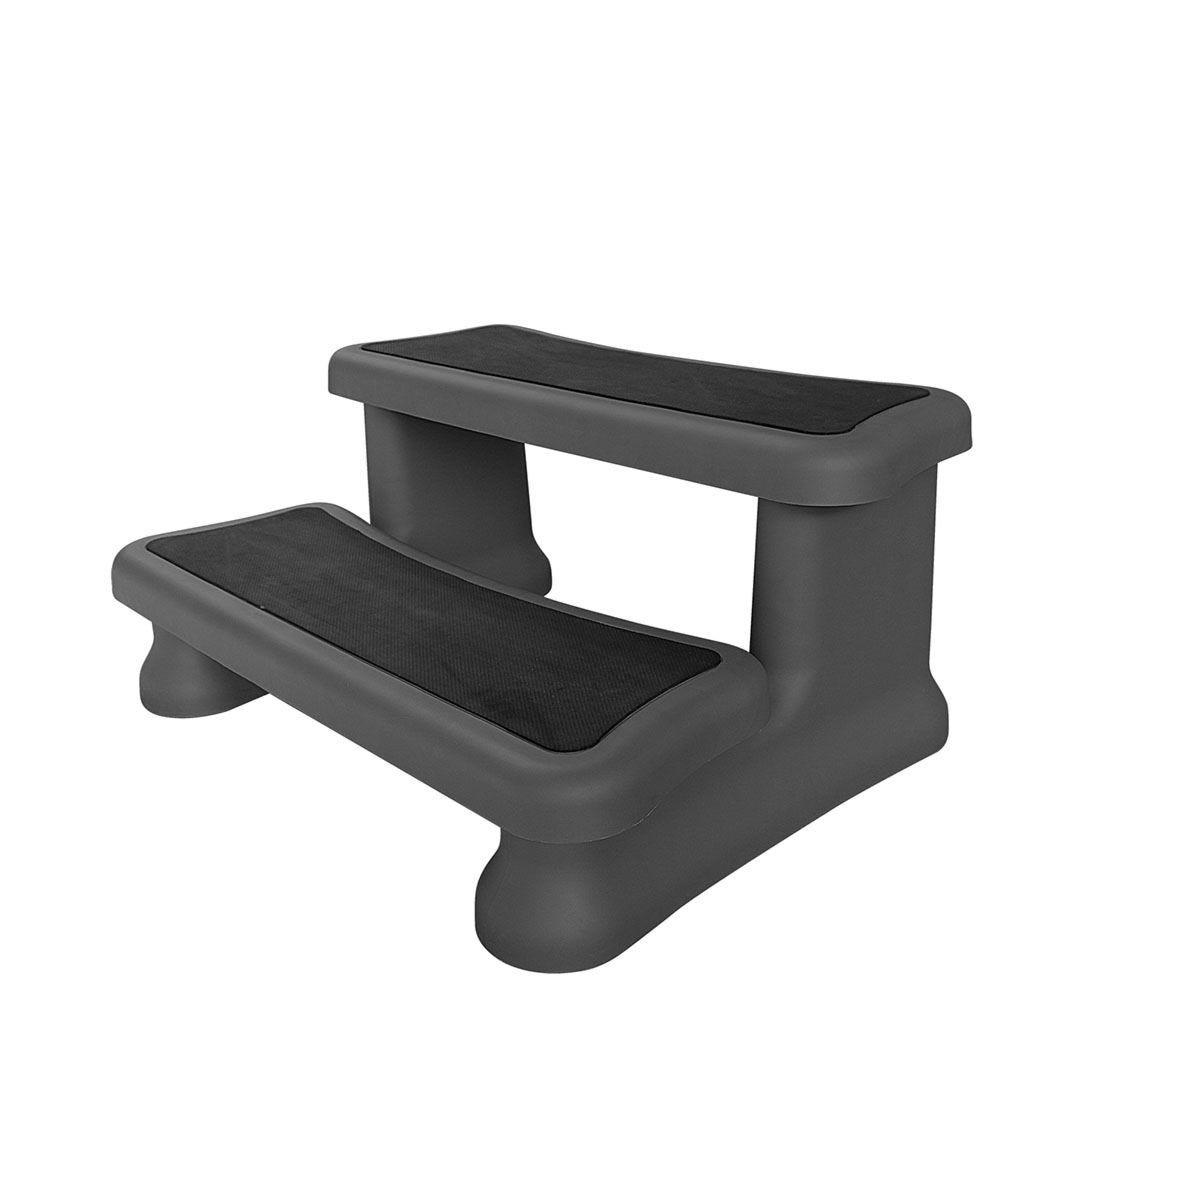 Canadian Spa Plastic Steps Spa - Black